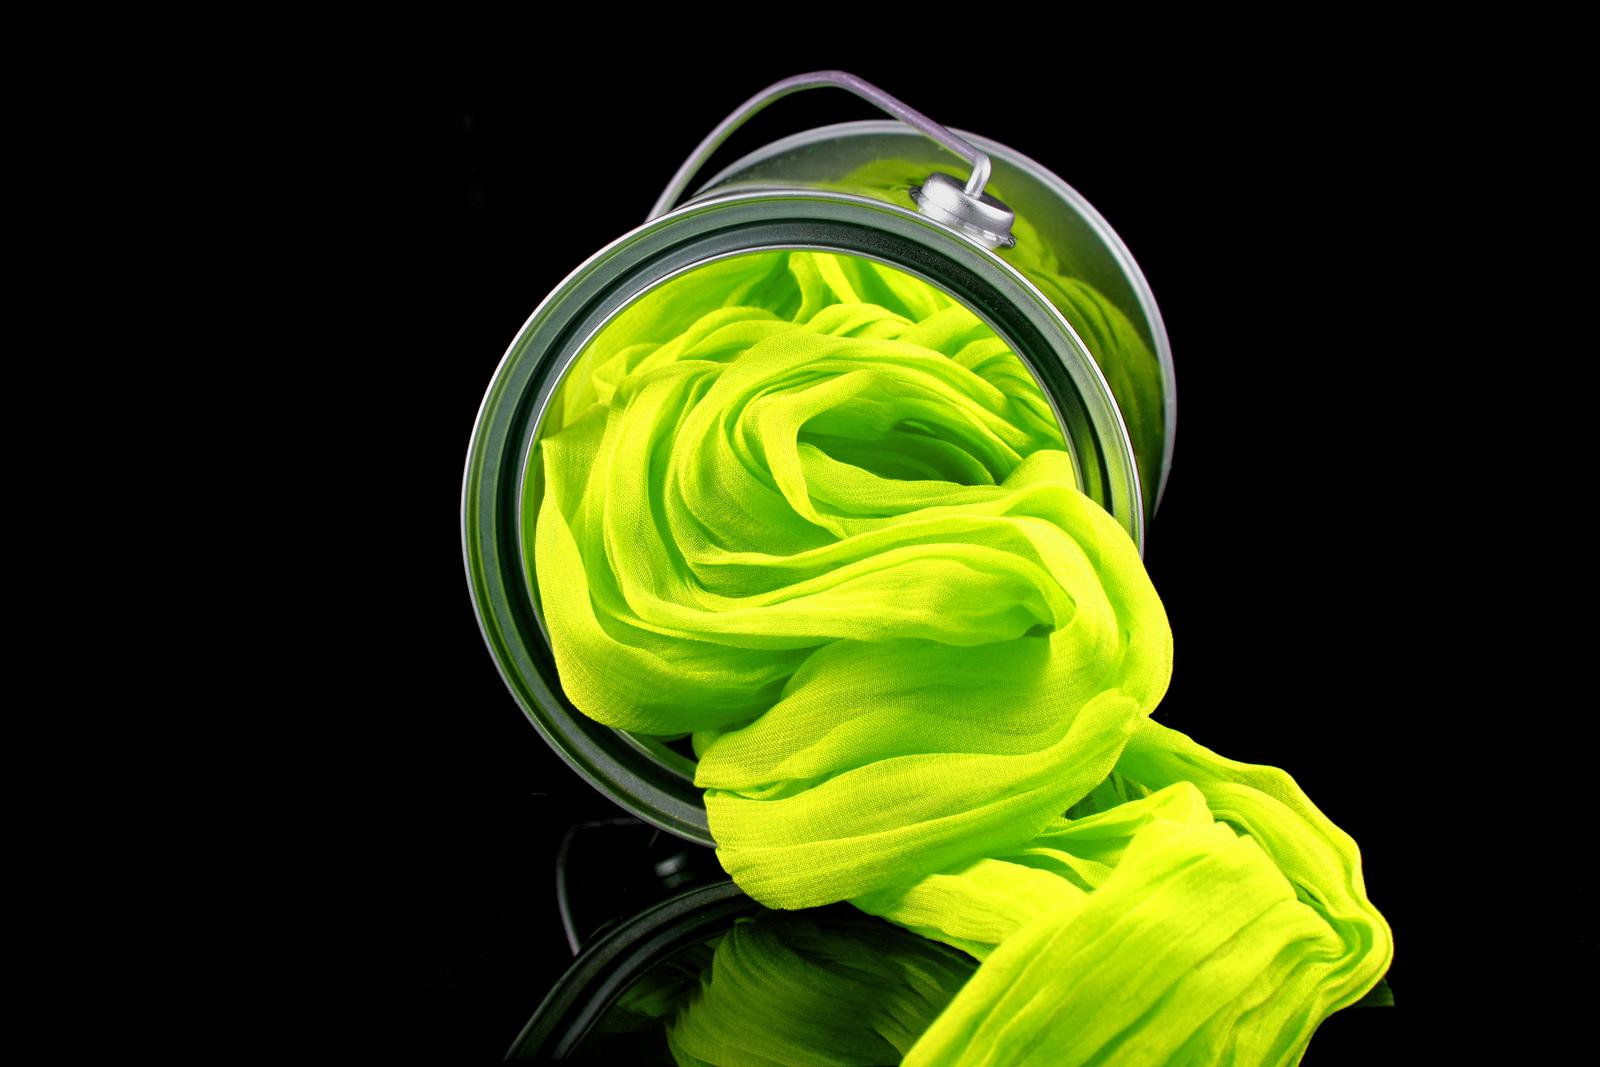 bigstock-Flowing-Green-1275722.jpg